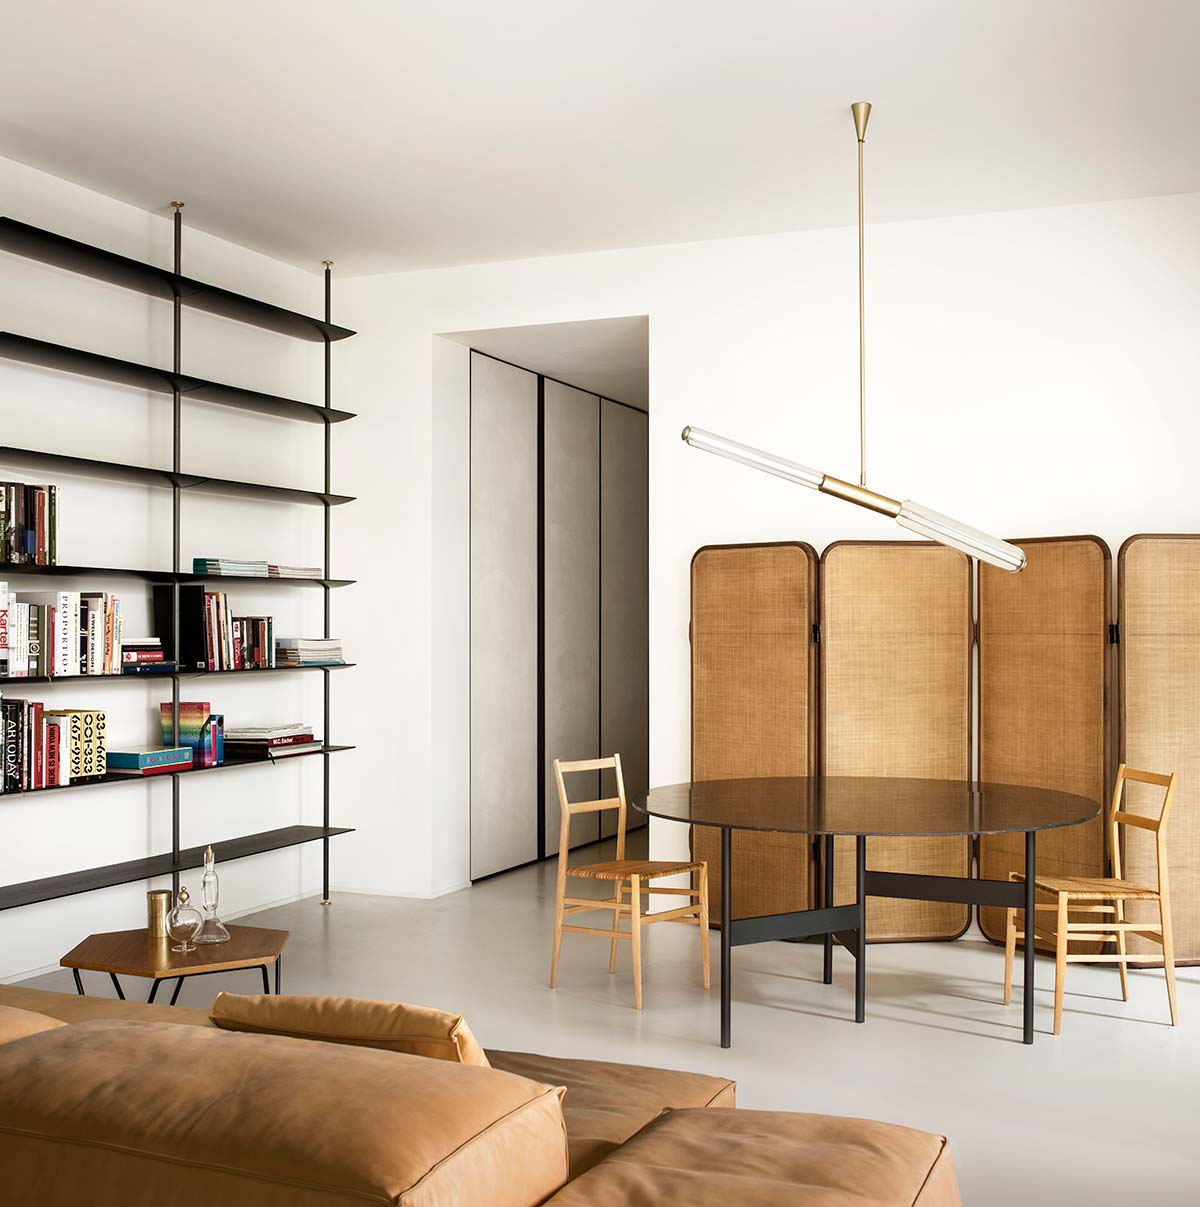 Private Apartment, Milan - Design David Lopez Quincoces